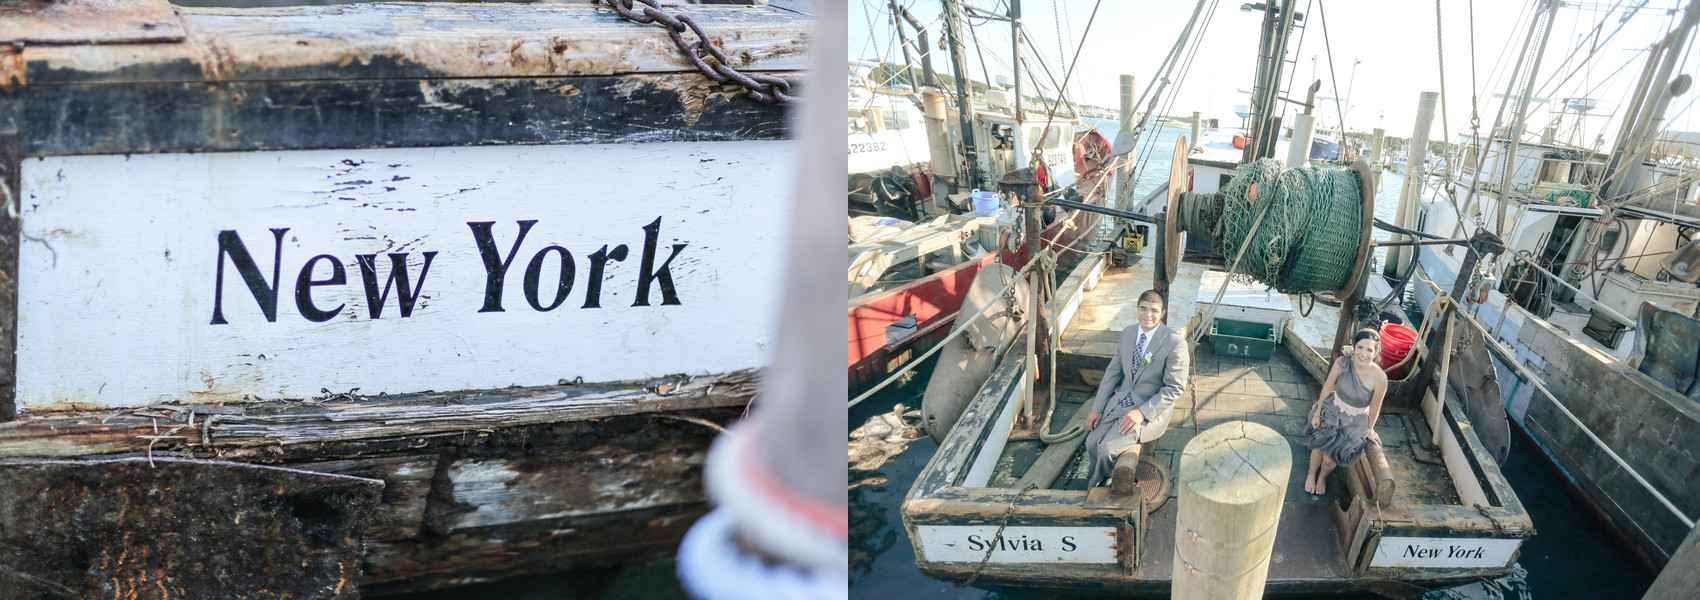 Schiff und NY